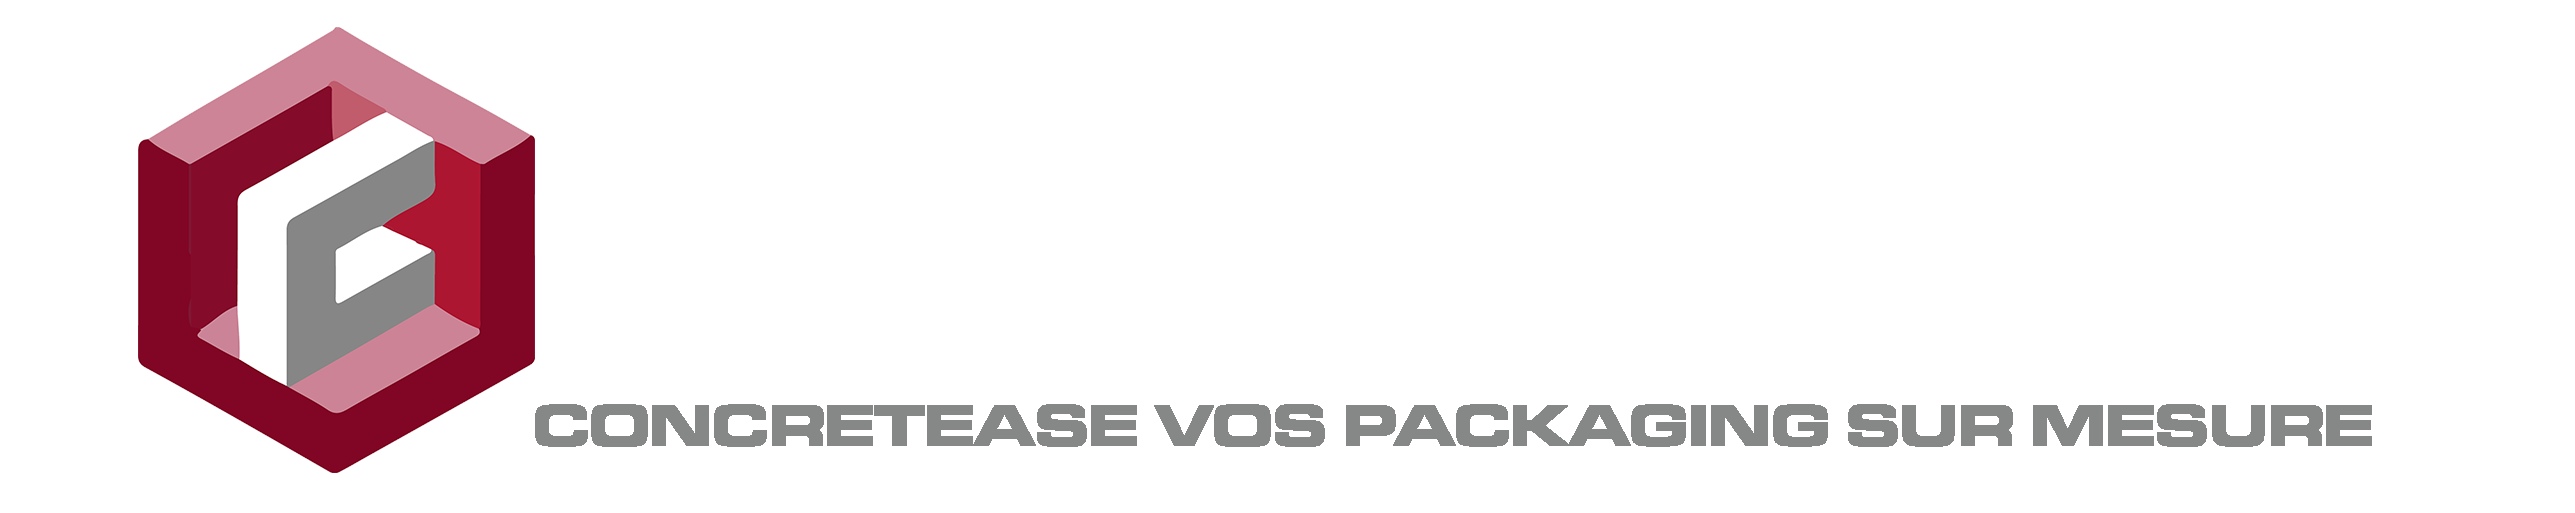 concretease-packaging